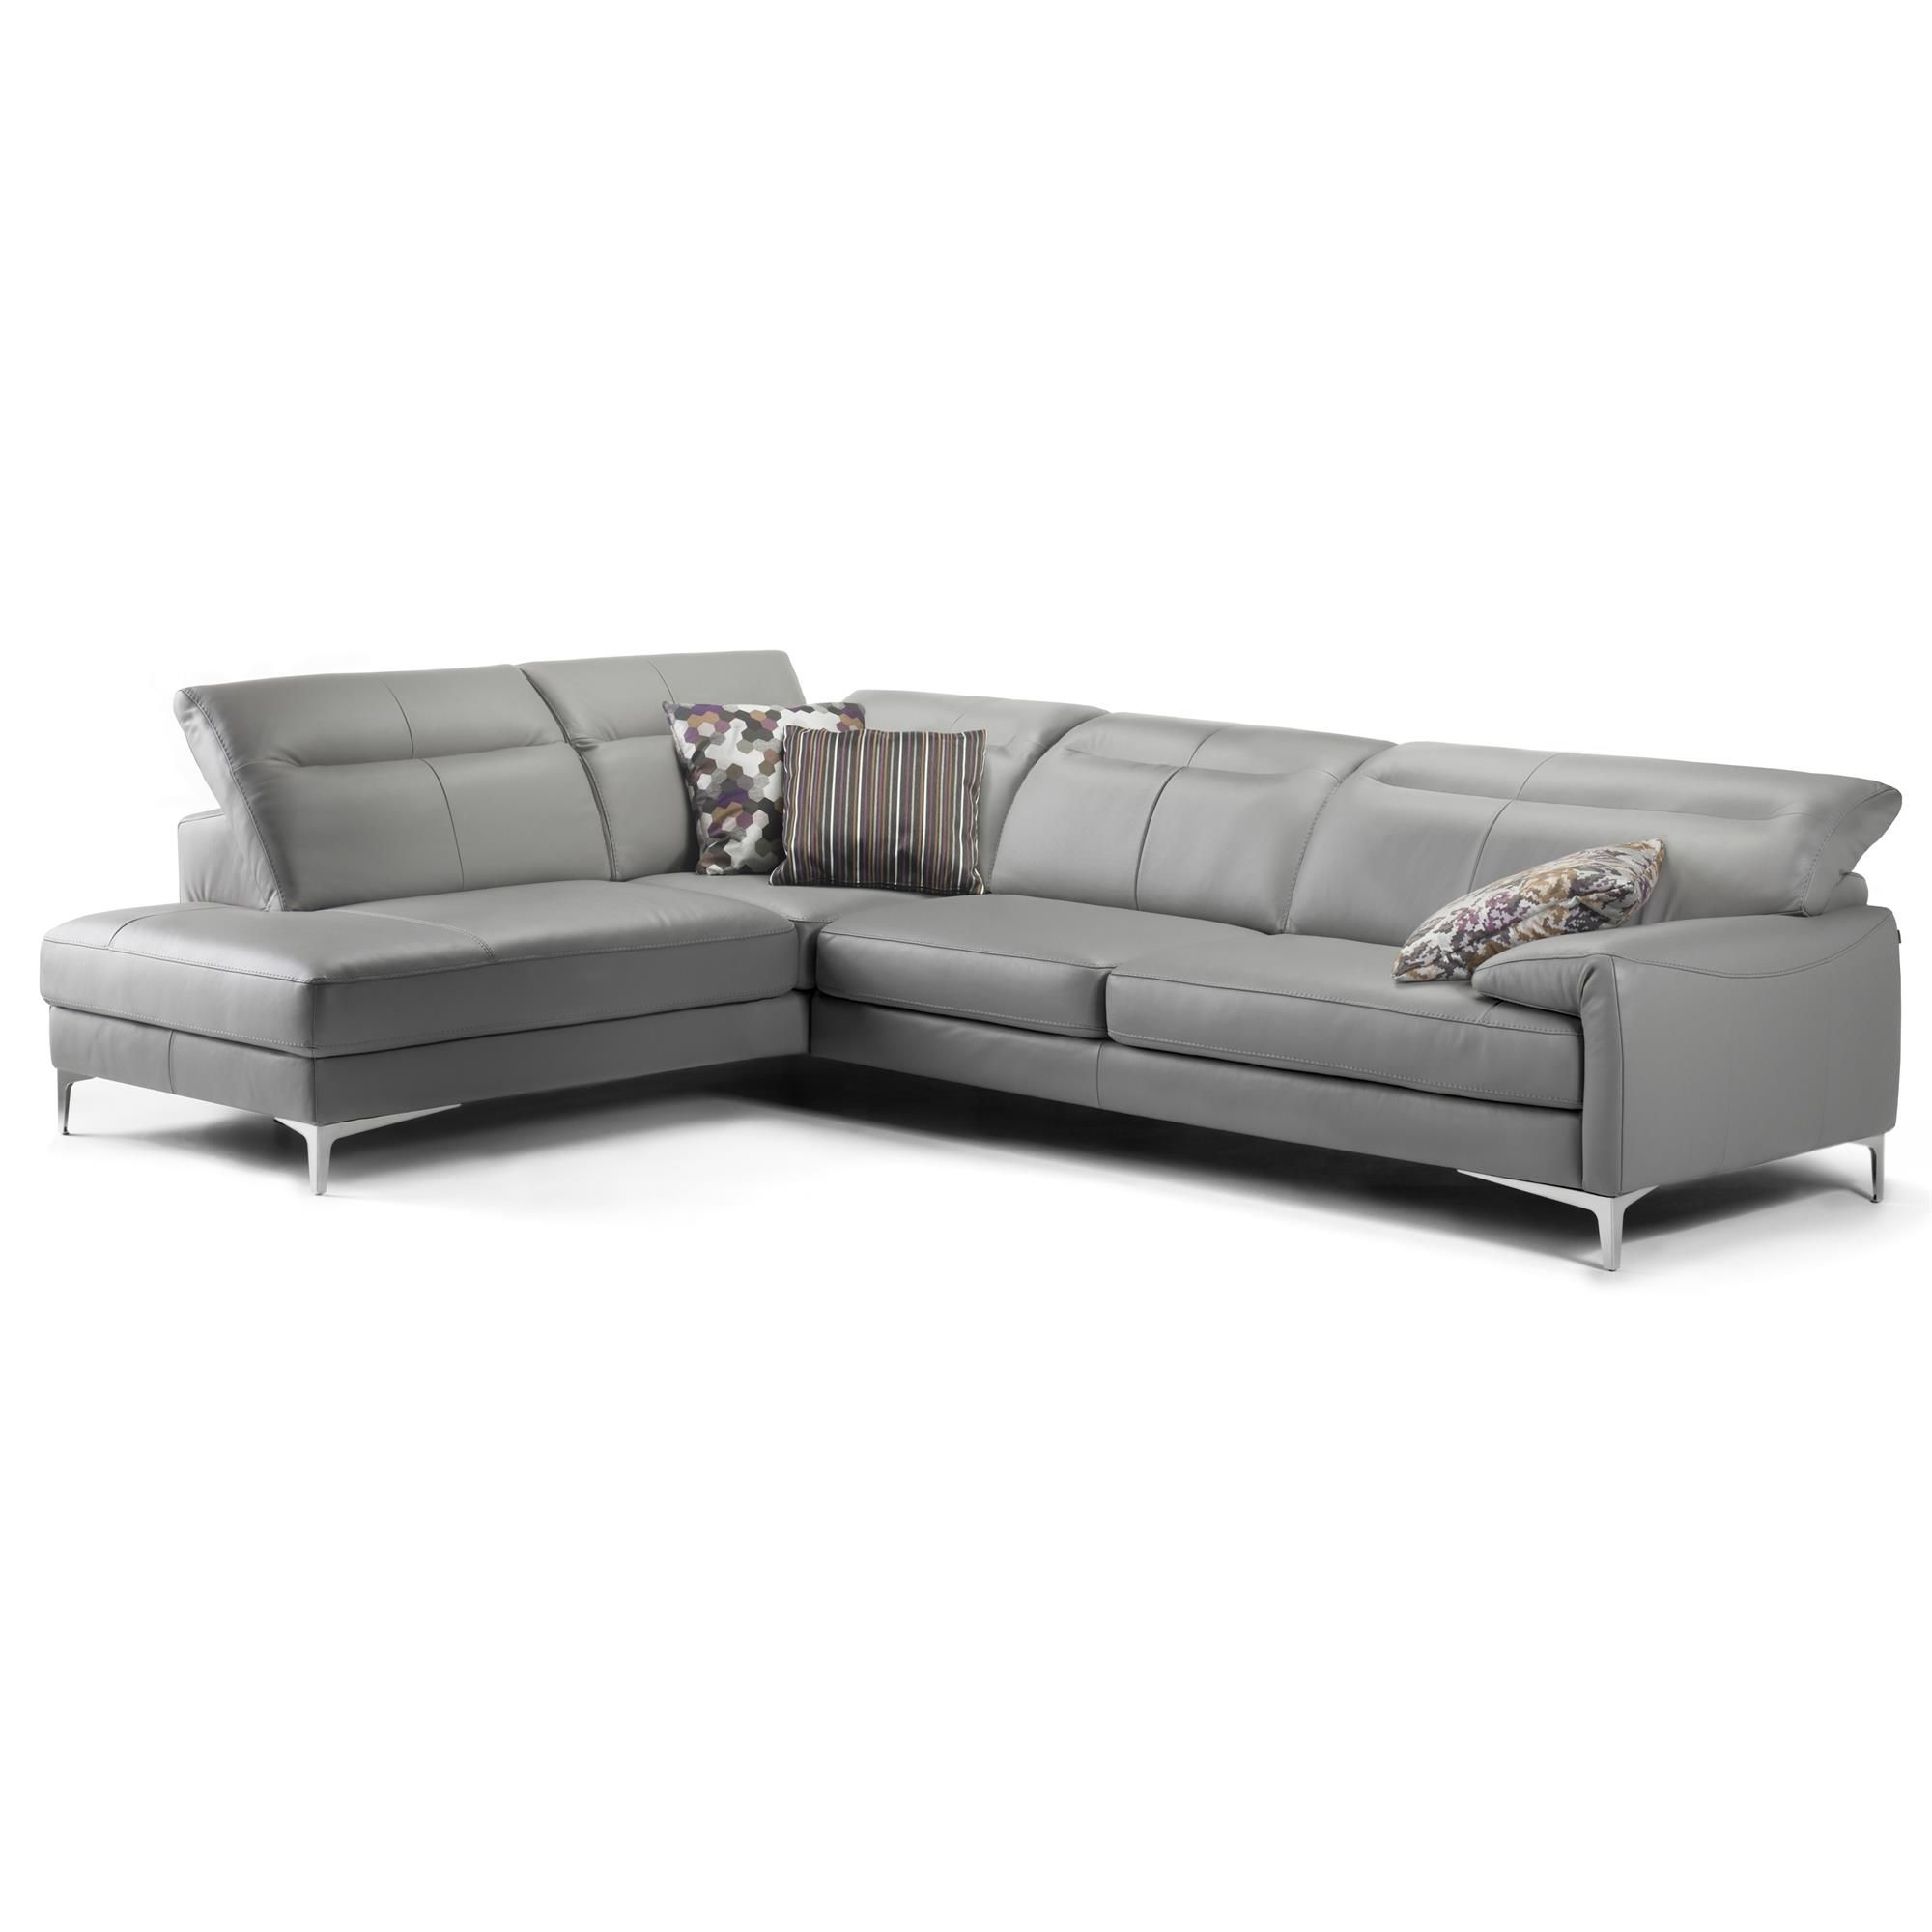 ROM Aruba Leather Corner Sofas From Queenstreet Carpets U0026 Furnishings